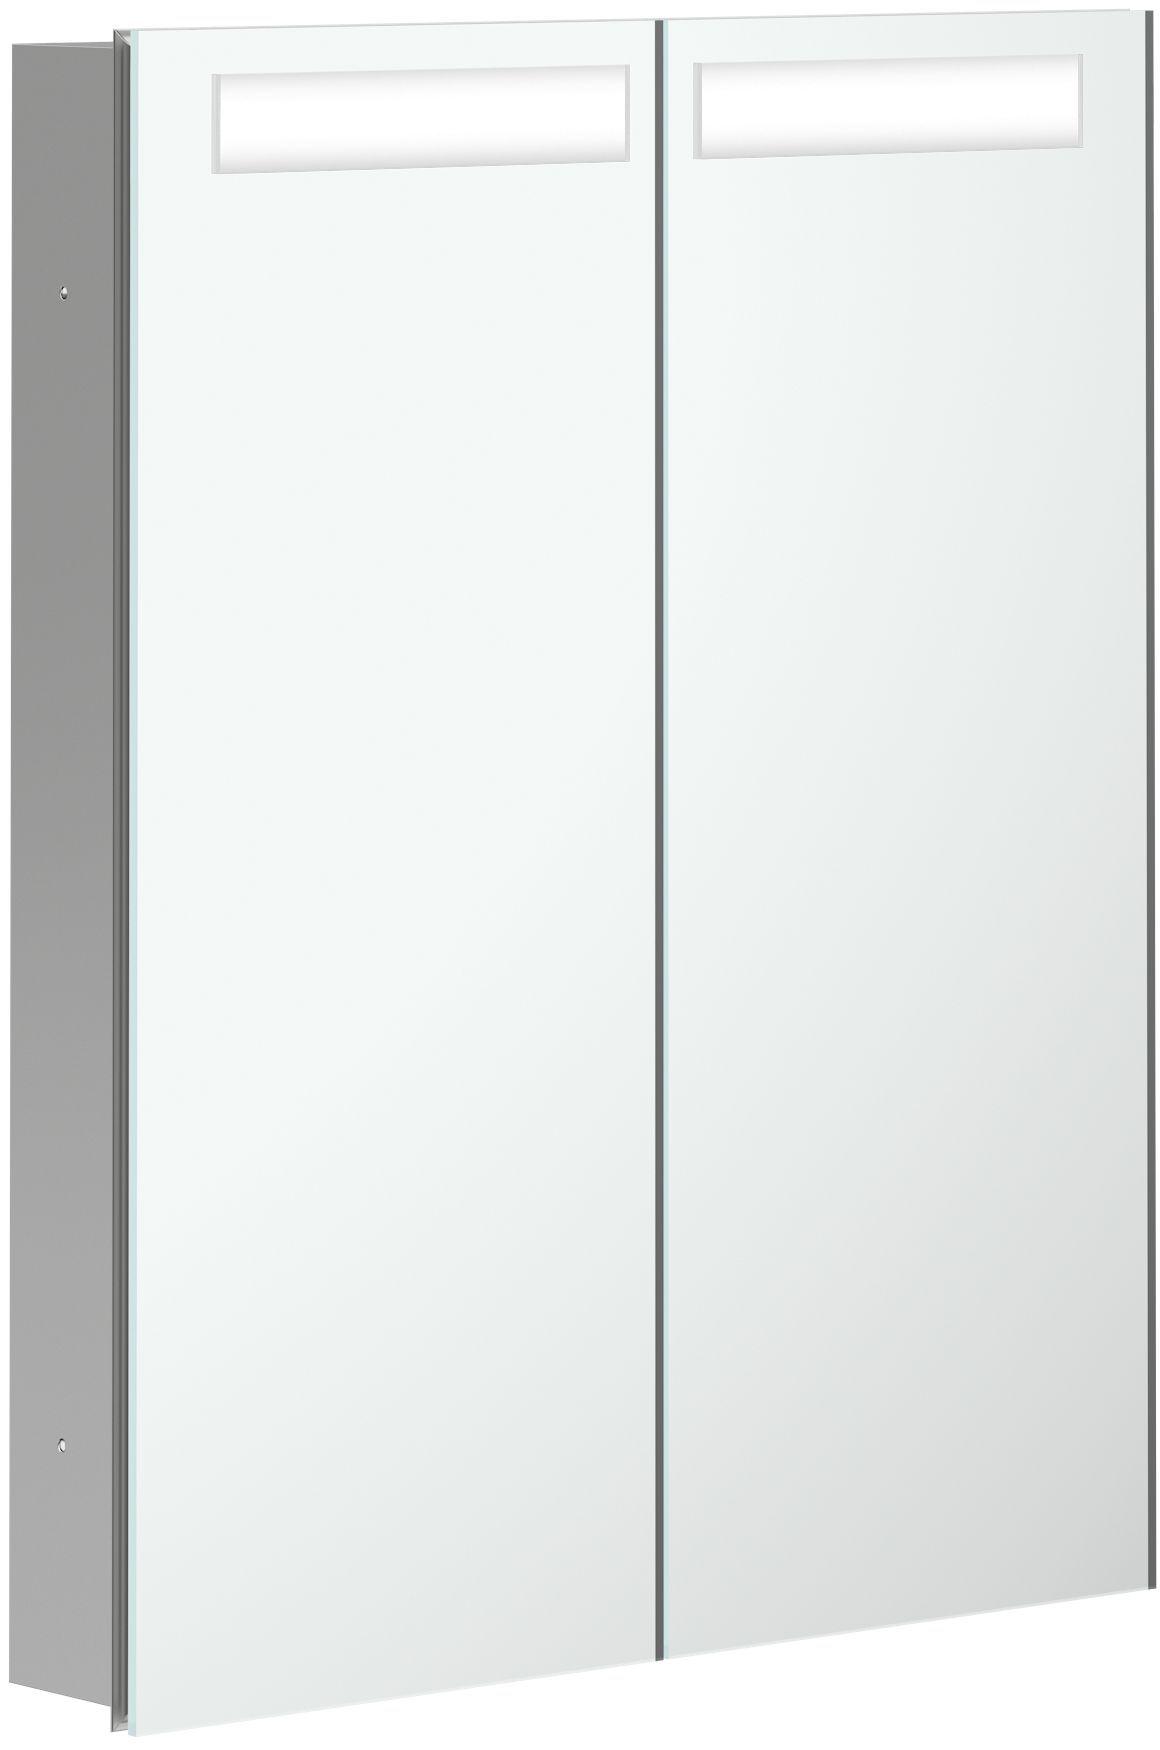 Villeroy & Boch My View In Spiegelschrank mit LED Beleuchtung B:60,1xH:74,7xT:10,7cm A4356000